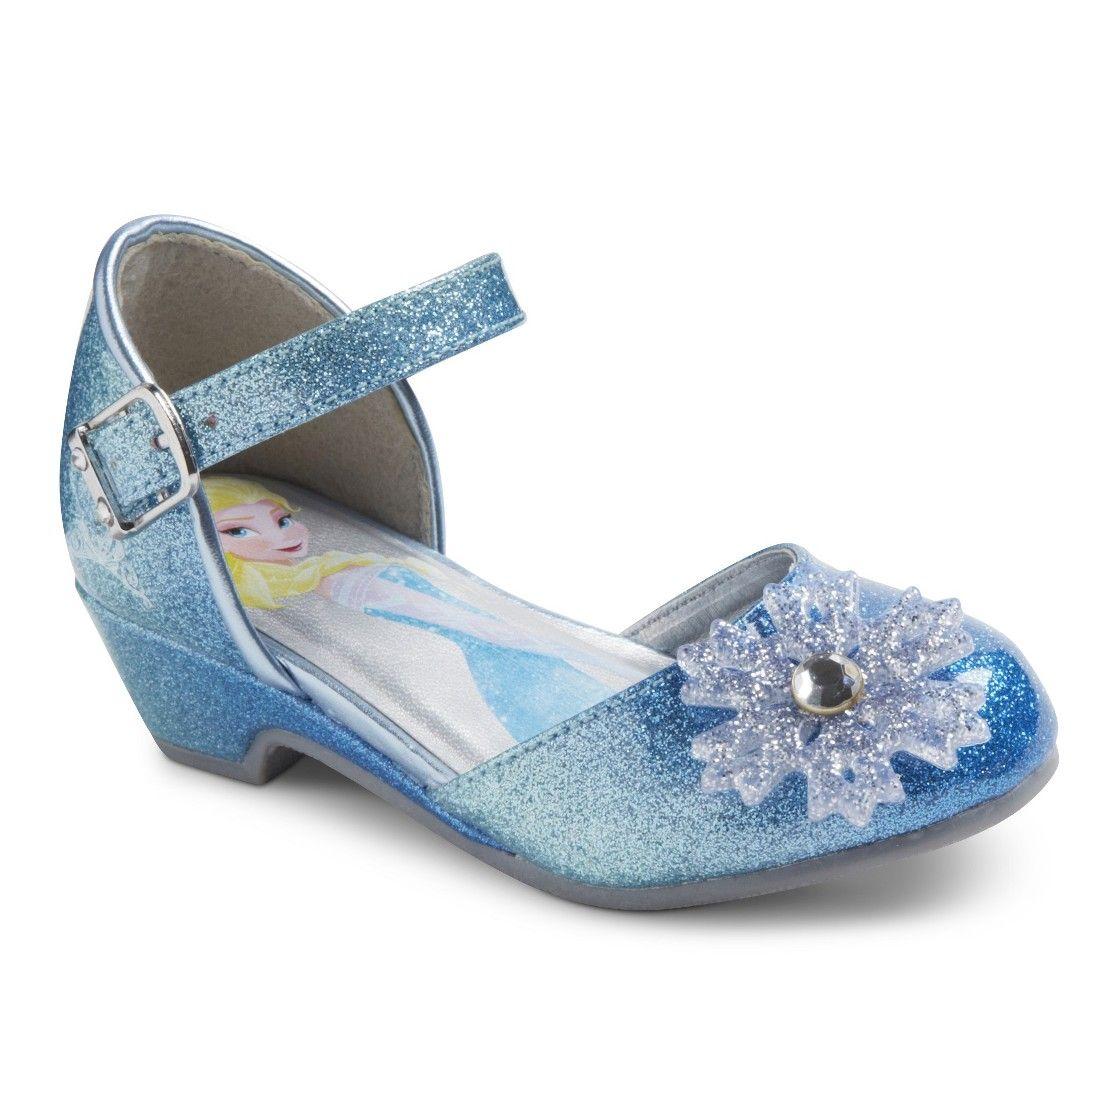 Disney Frozen Toddler Girl\'s Ballet Shoes - Blue | Wedding ...